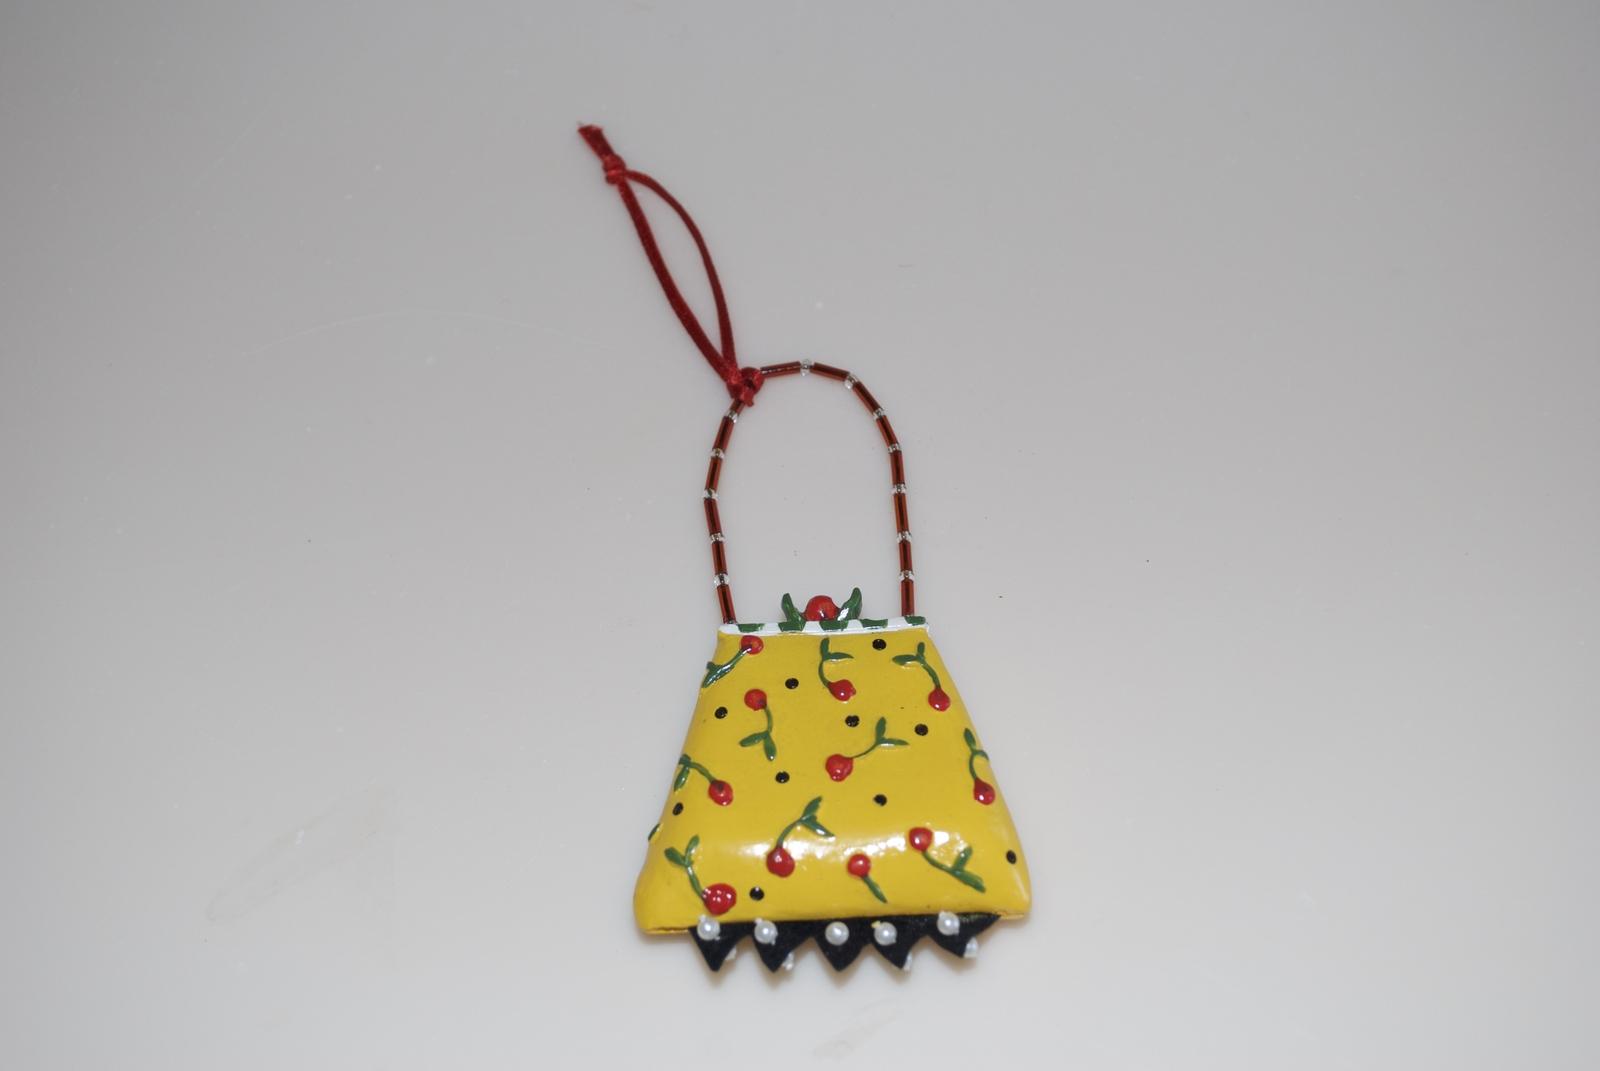 Mary Engelbreit Christmas Yellow Red Cherry Purse Handbag Ornament